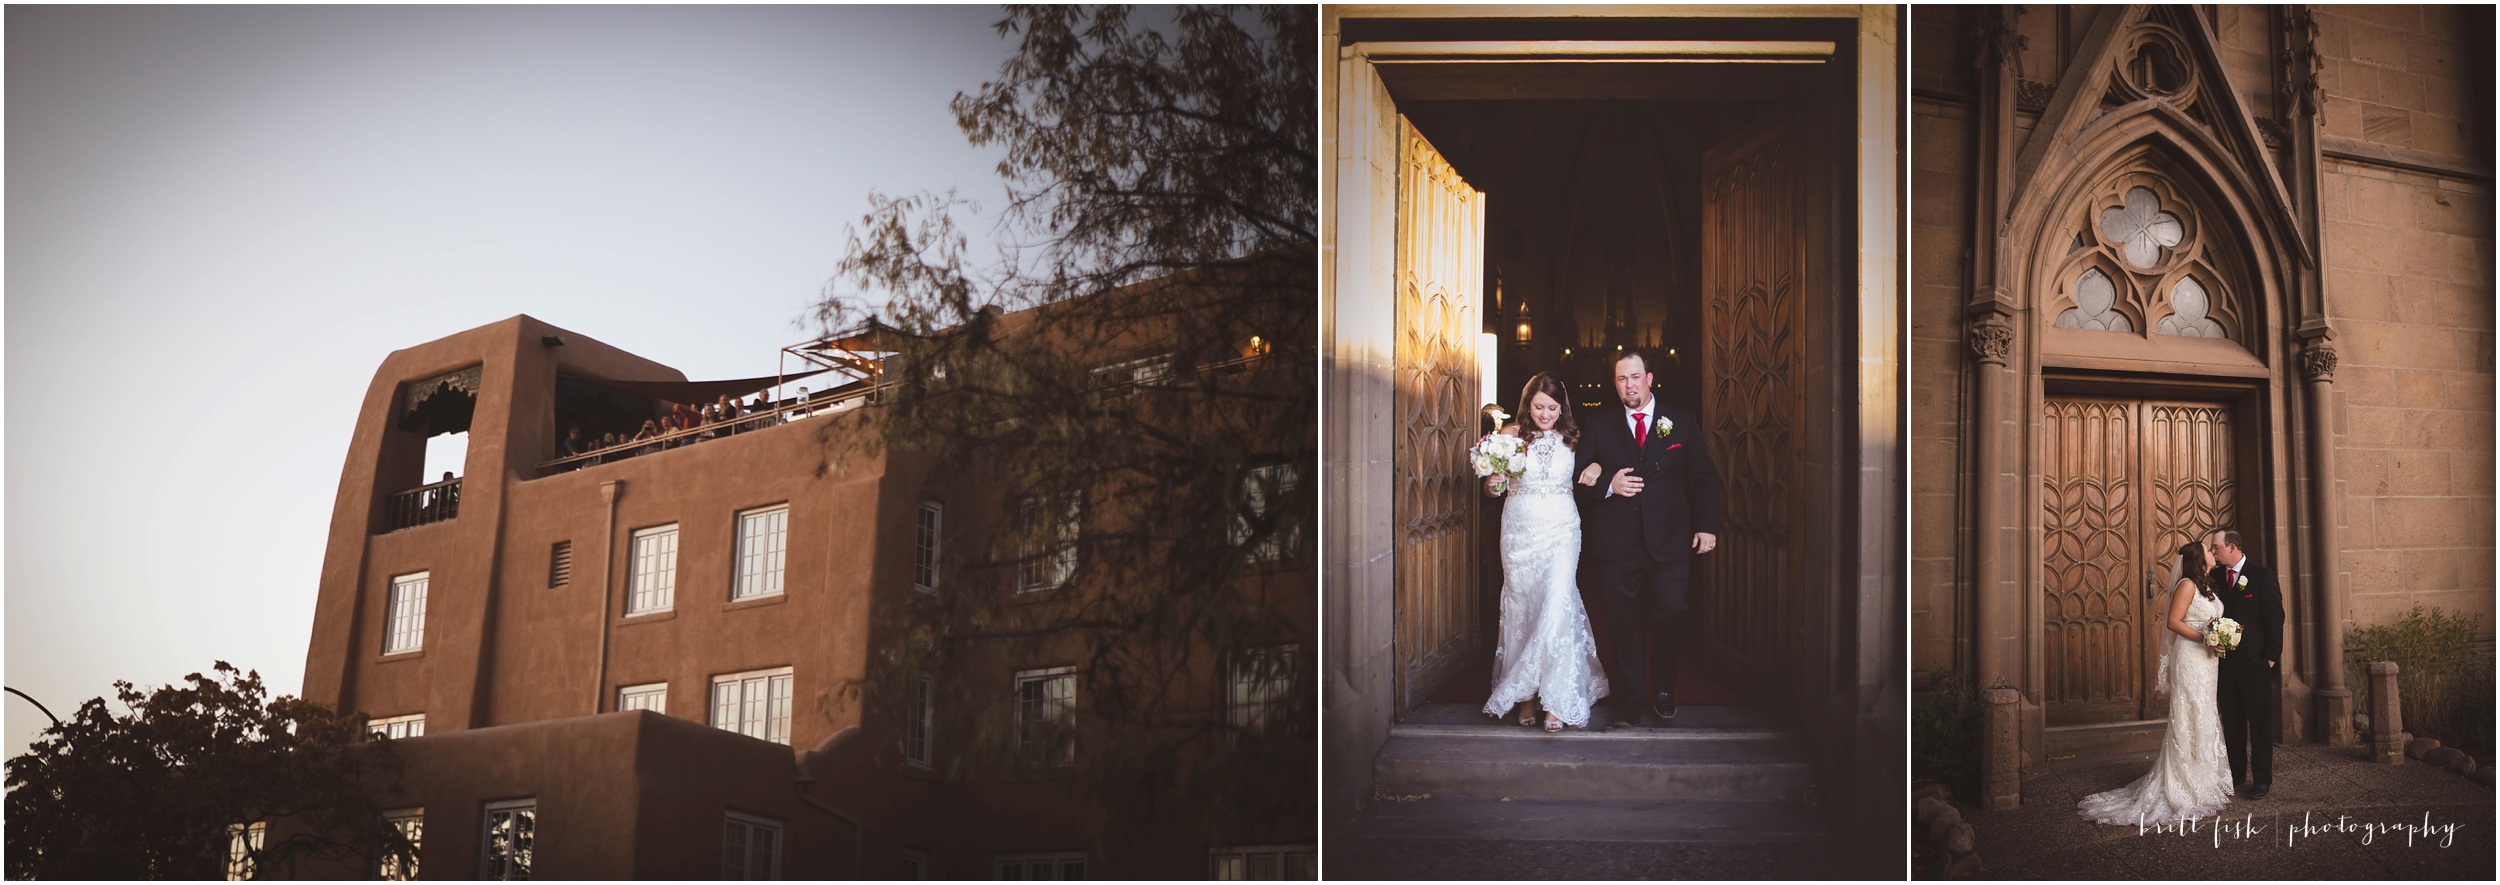 Wedding - Wood - Santa Fe, NM_0025.jpg